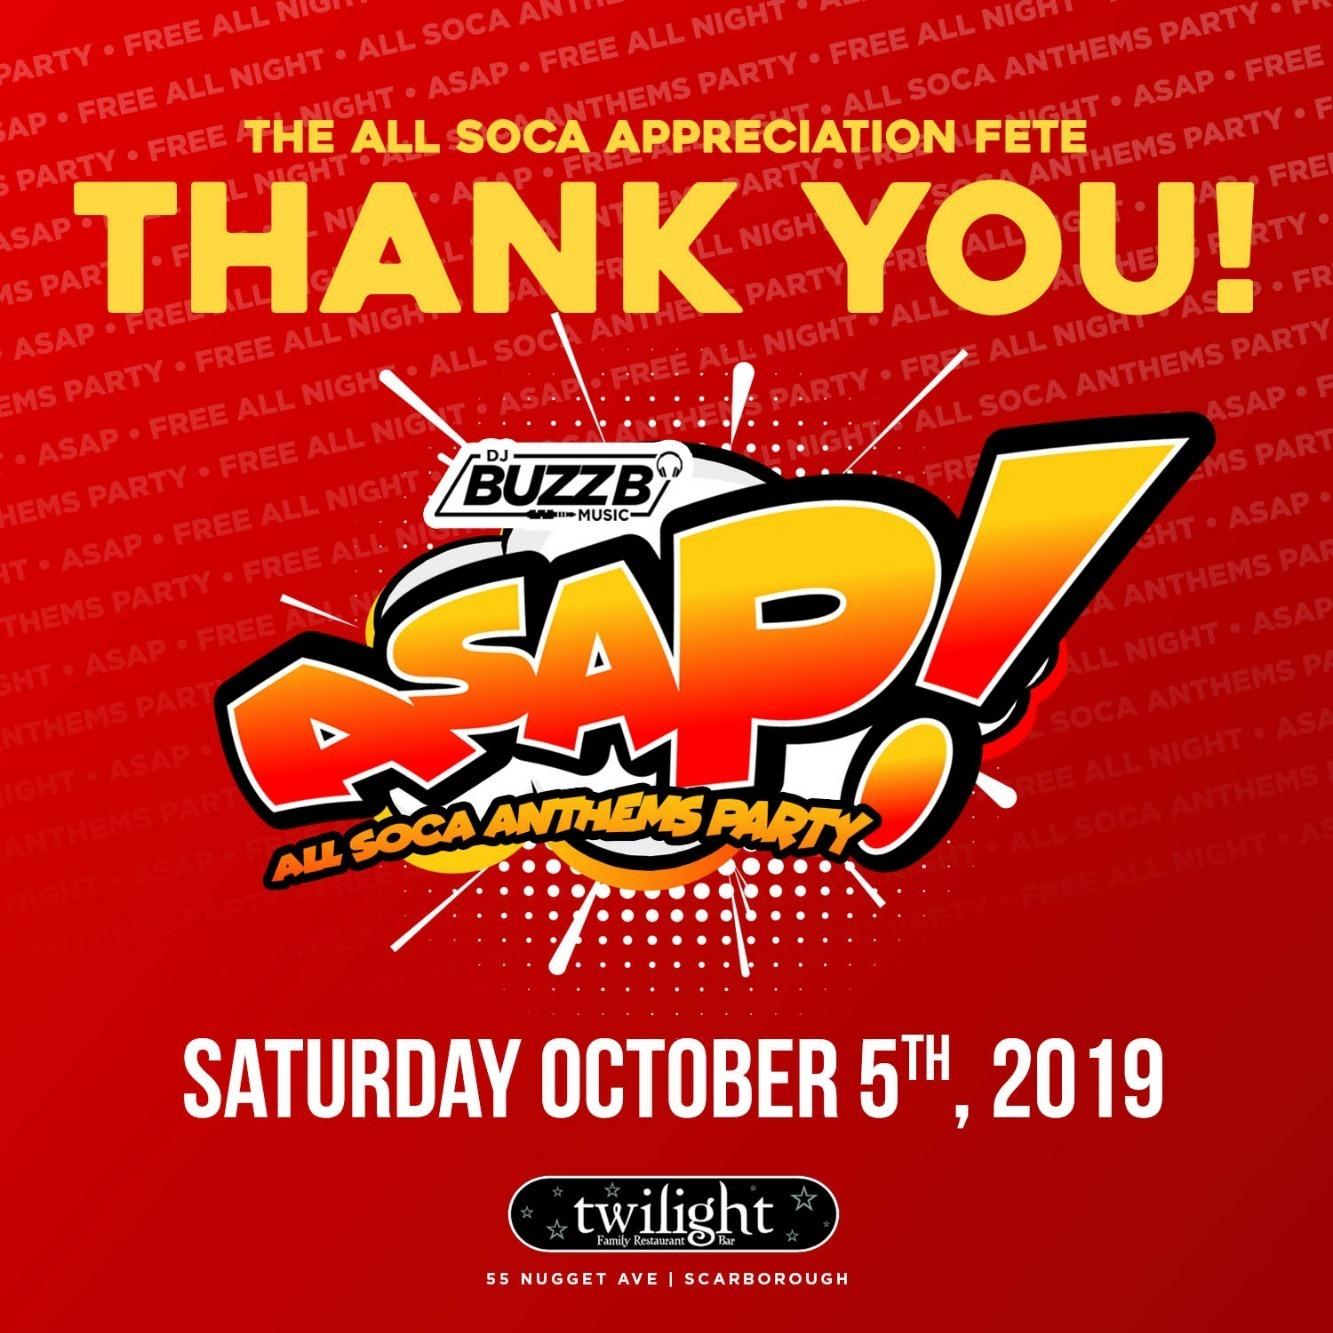 ASAP - ALL SOCA APPRECIATION PARTY EDITION